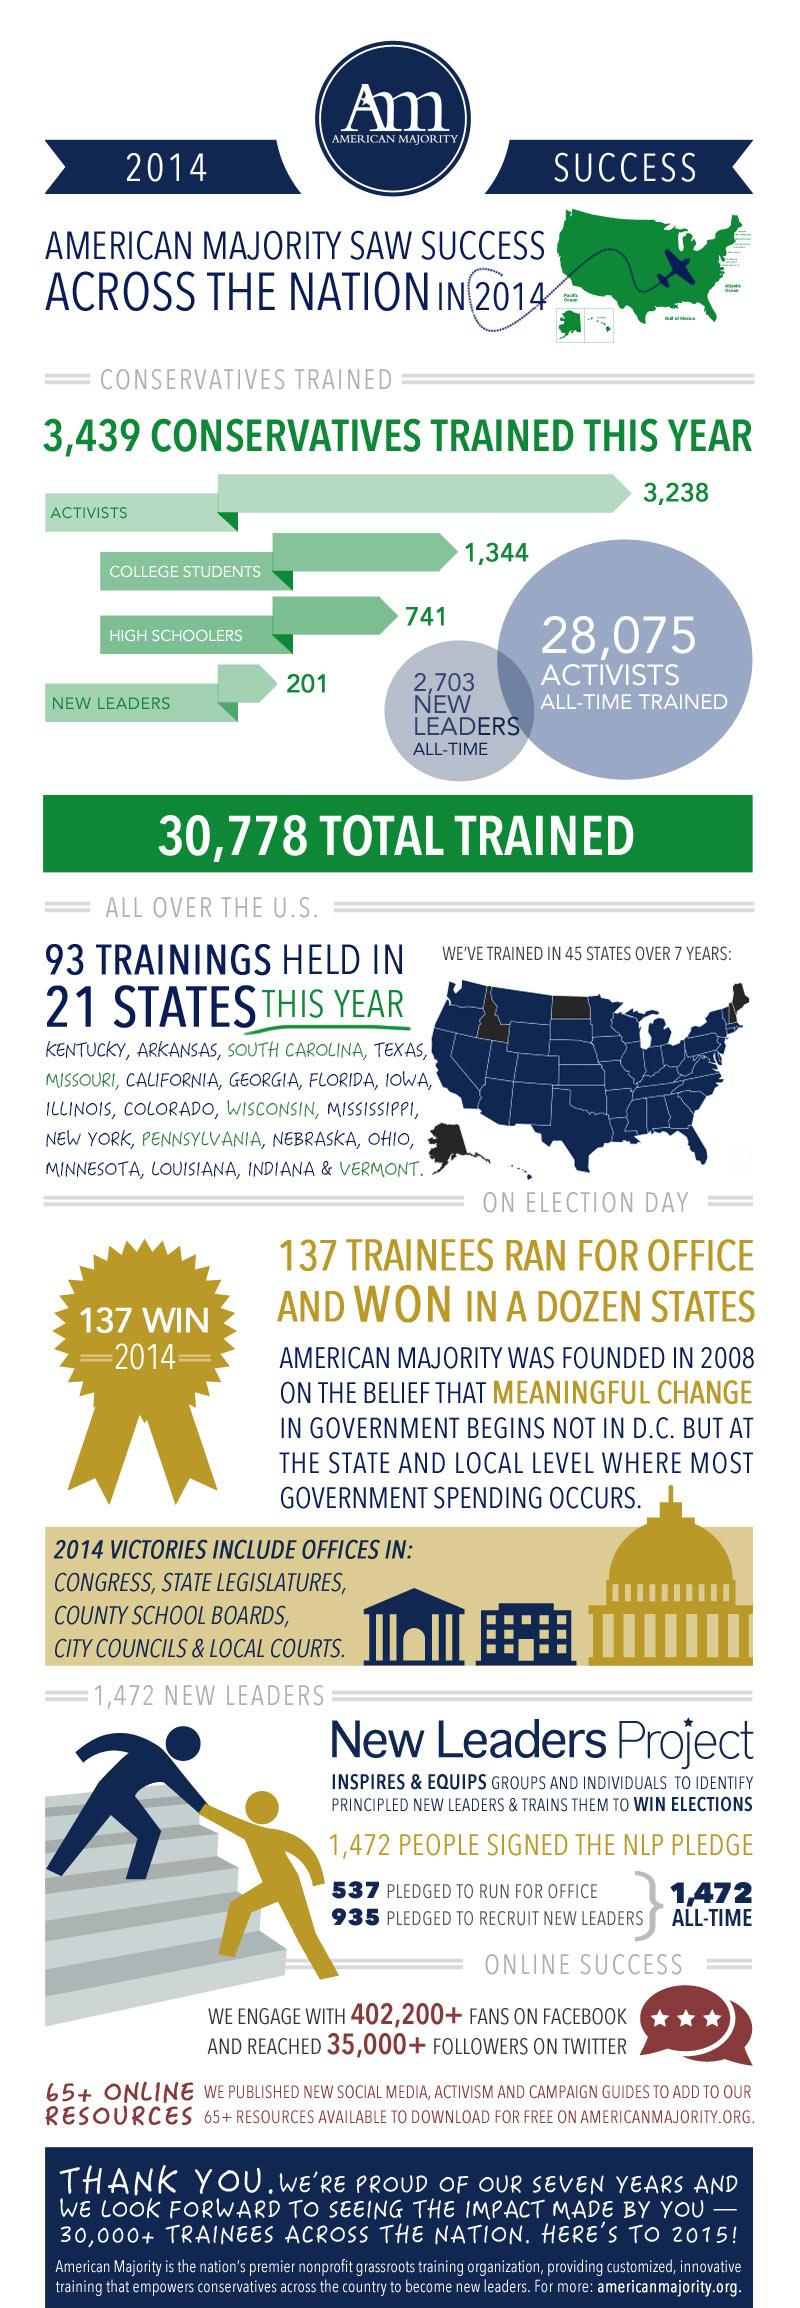 AM-2014-Success-infographic-